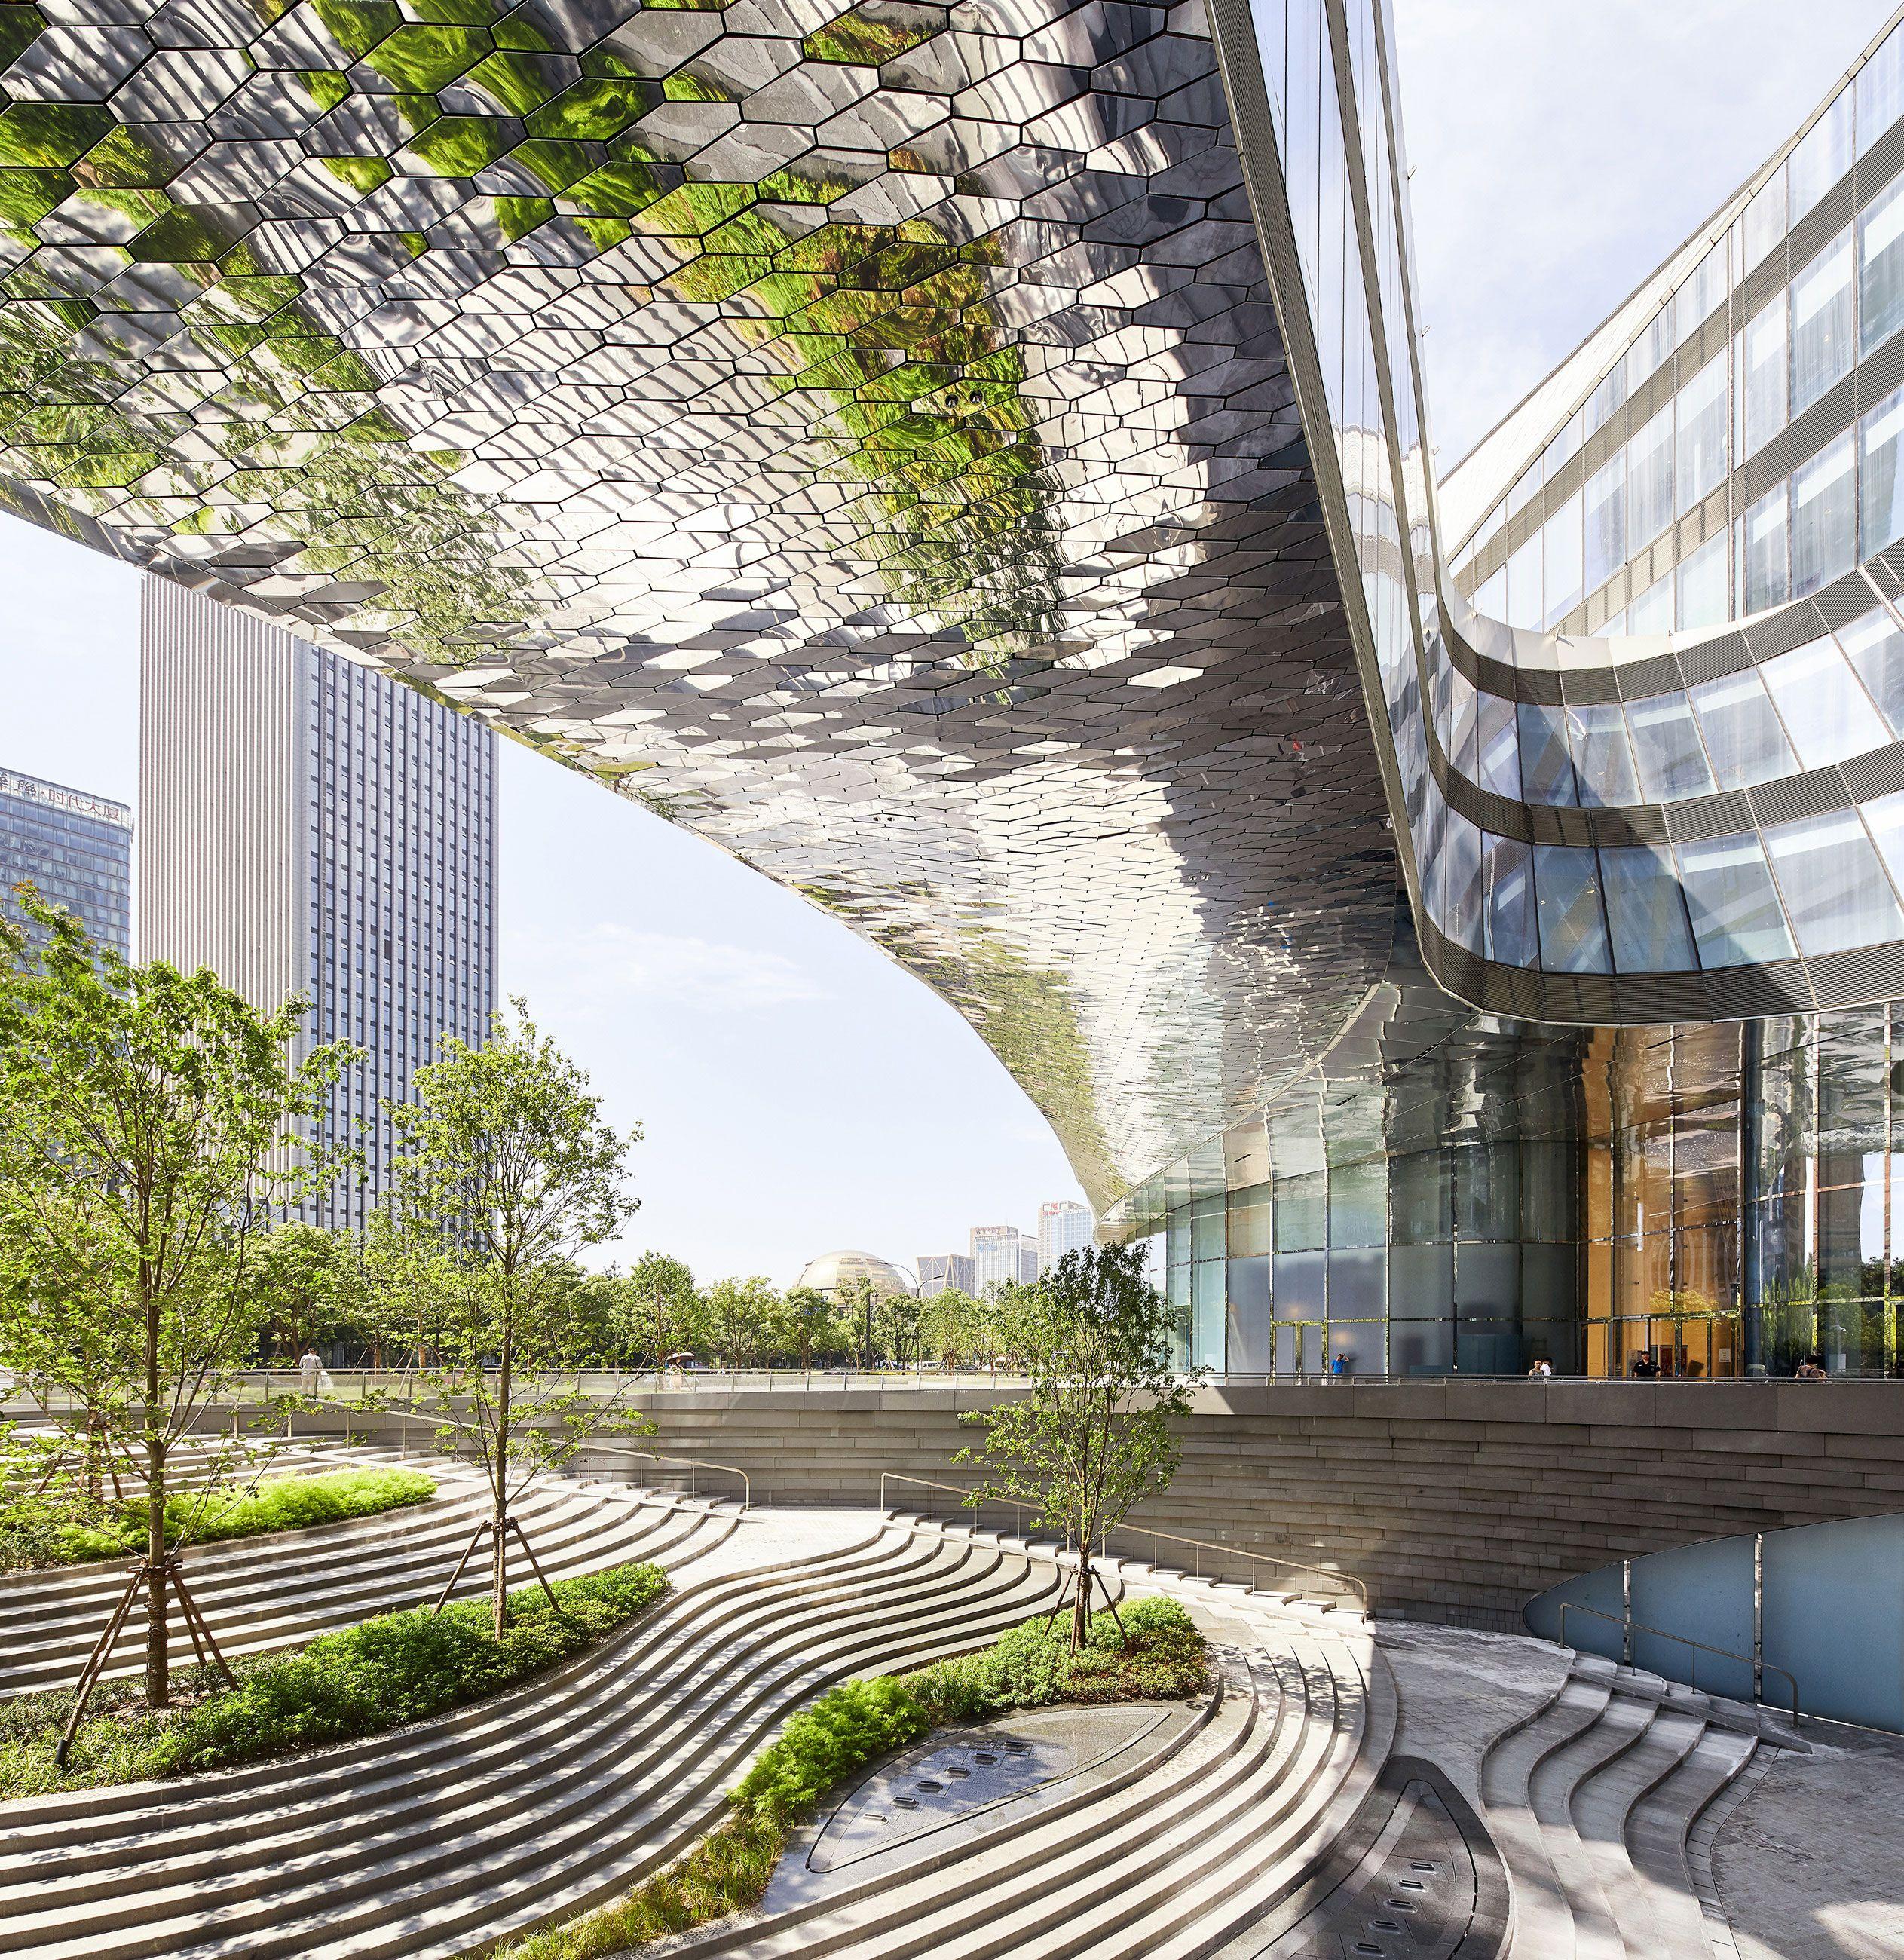 Raffles City Hangzhou Architect: Ben van Berkel/UNStudio  Client: CapitaLand China © Hufton + Crow